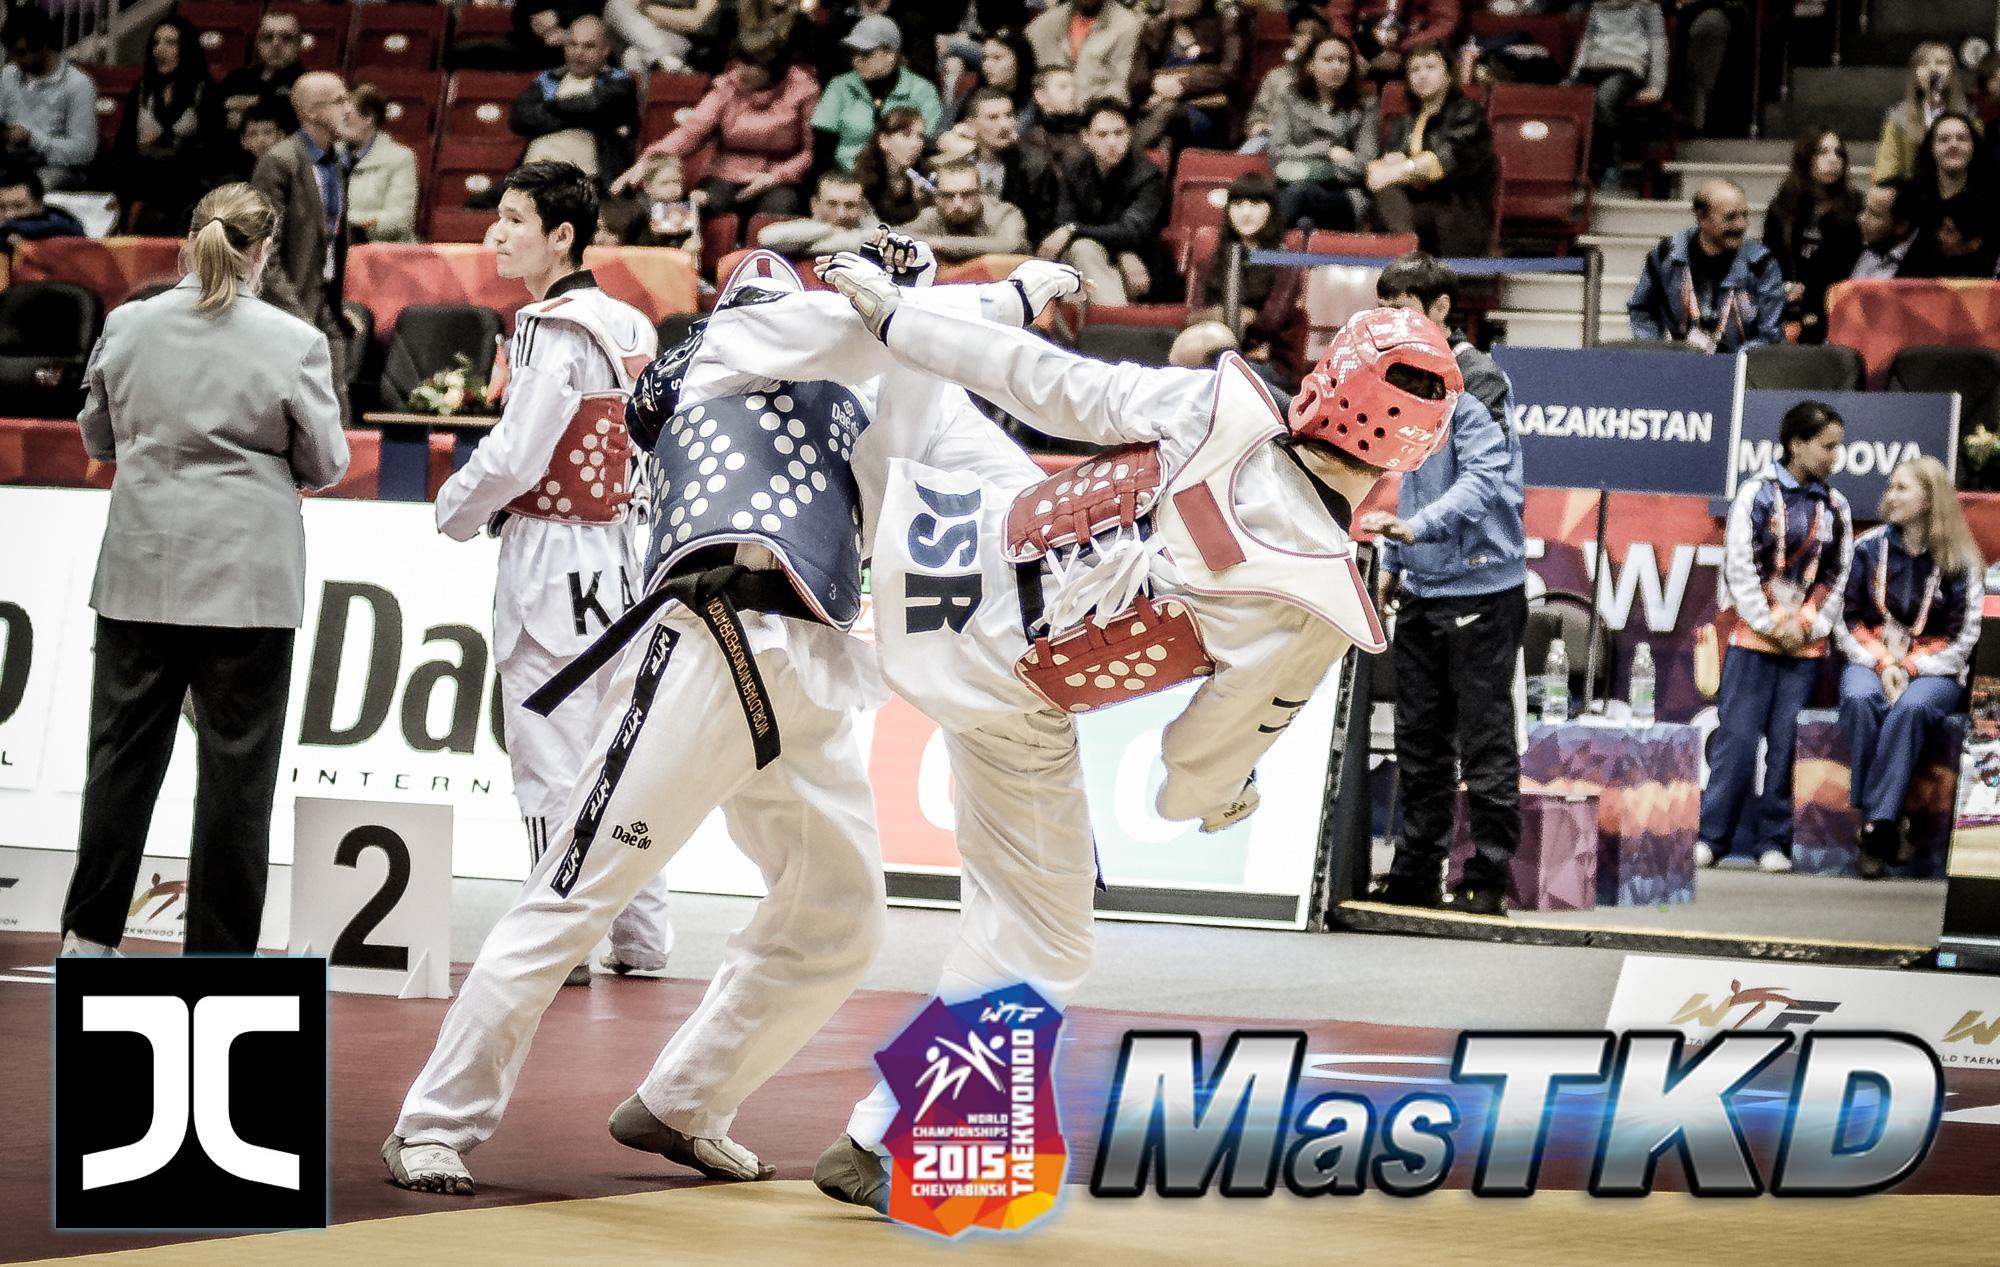 01_Mundial-Taekwondo_JCalicu-Seleccion-Mejor-Foto